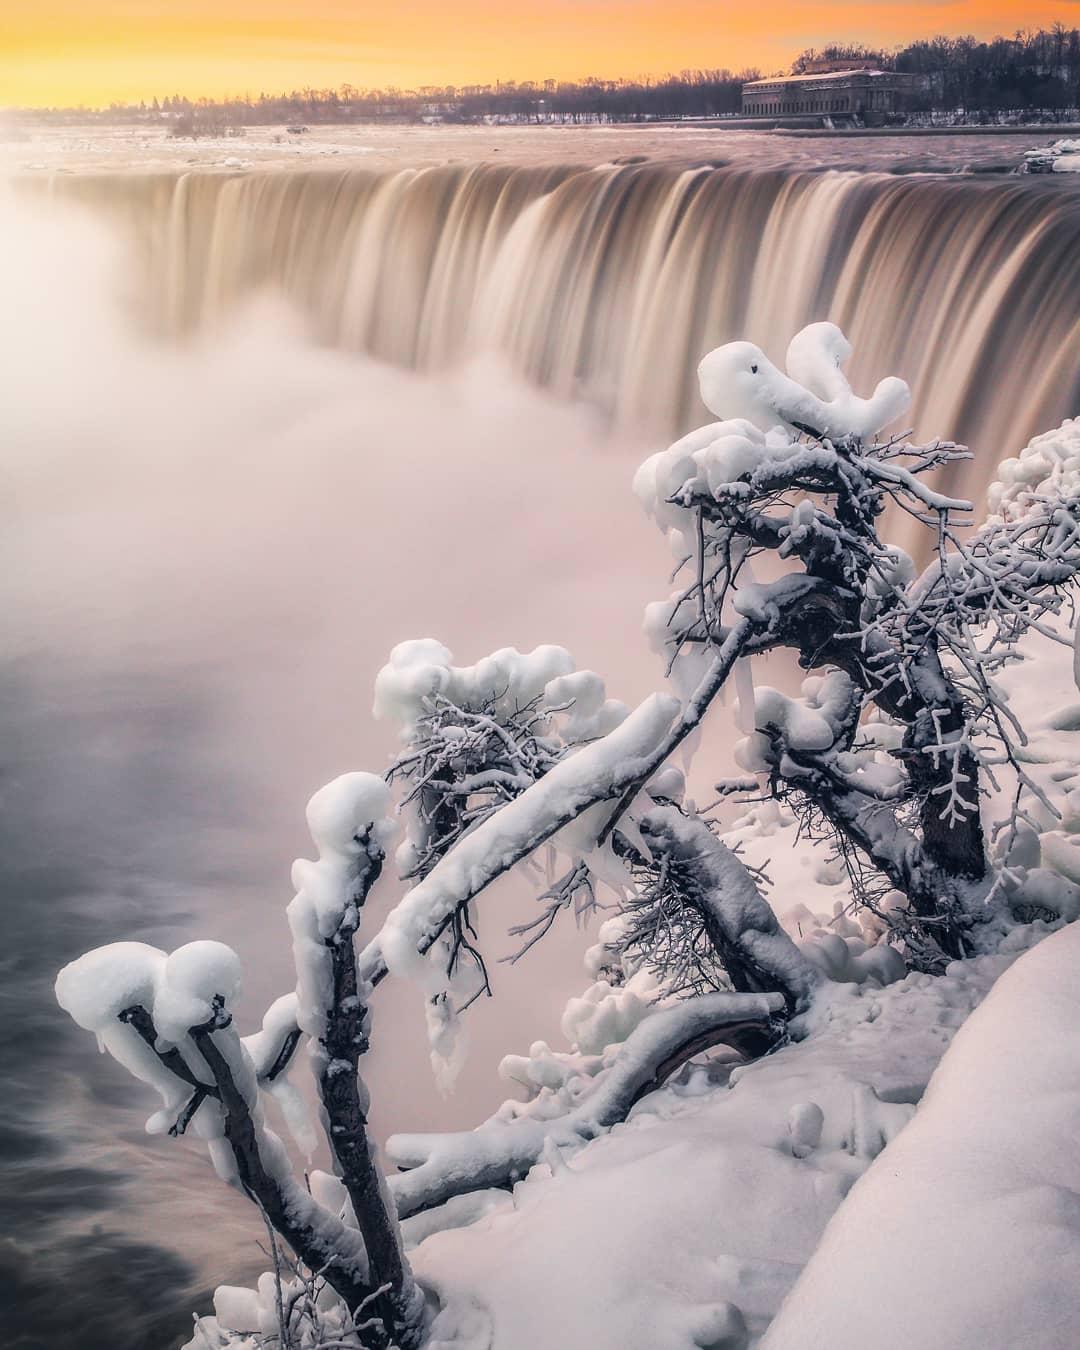 frozen nayagara water falls